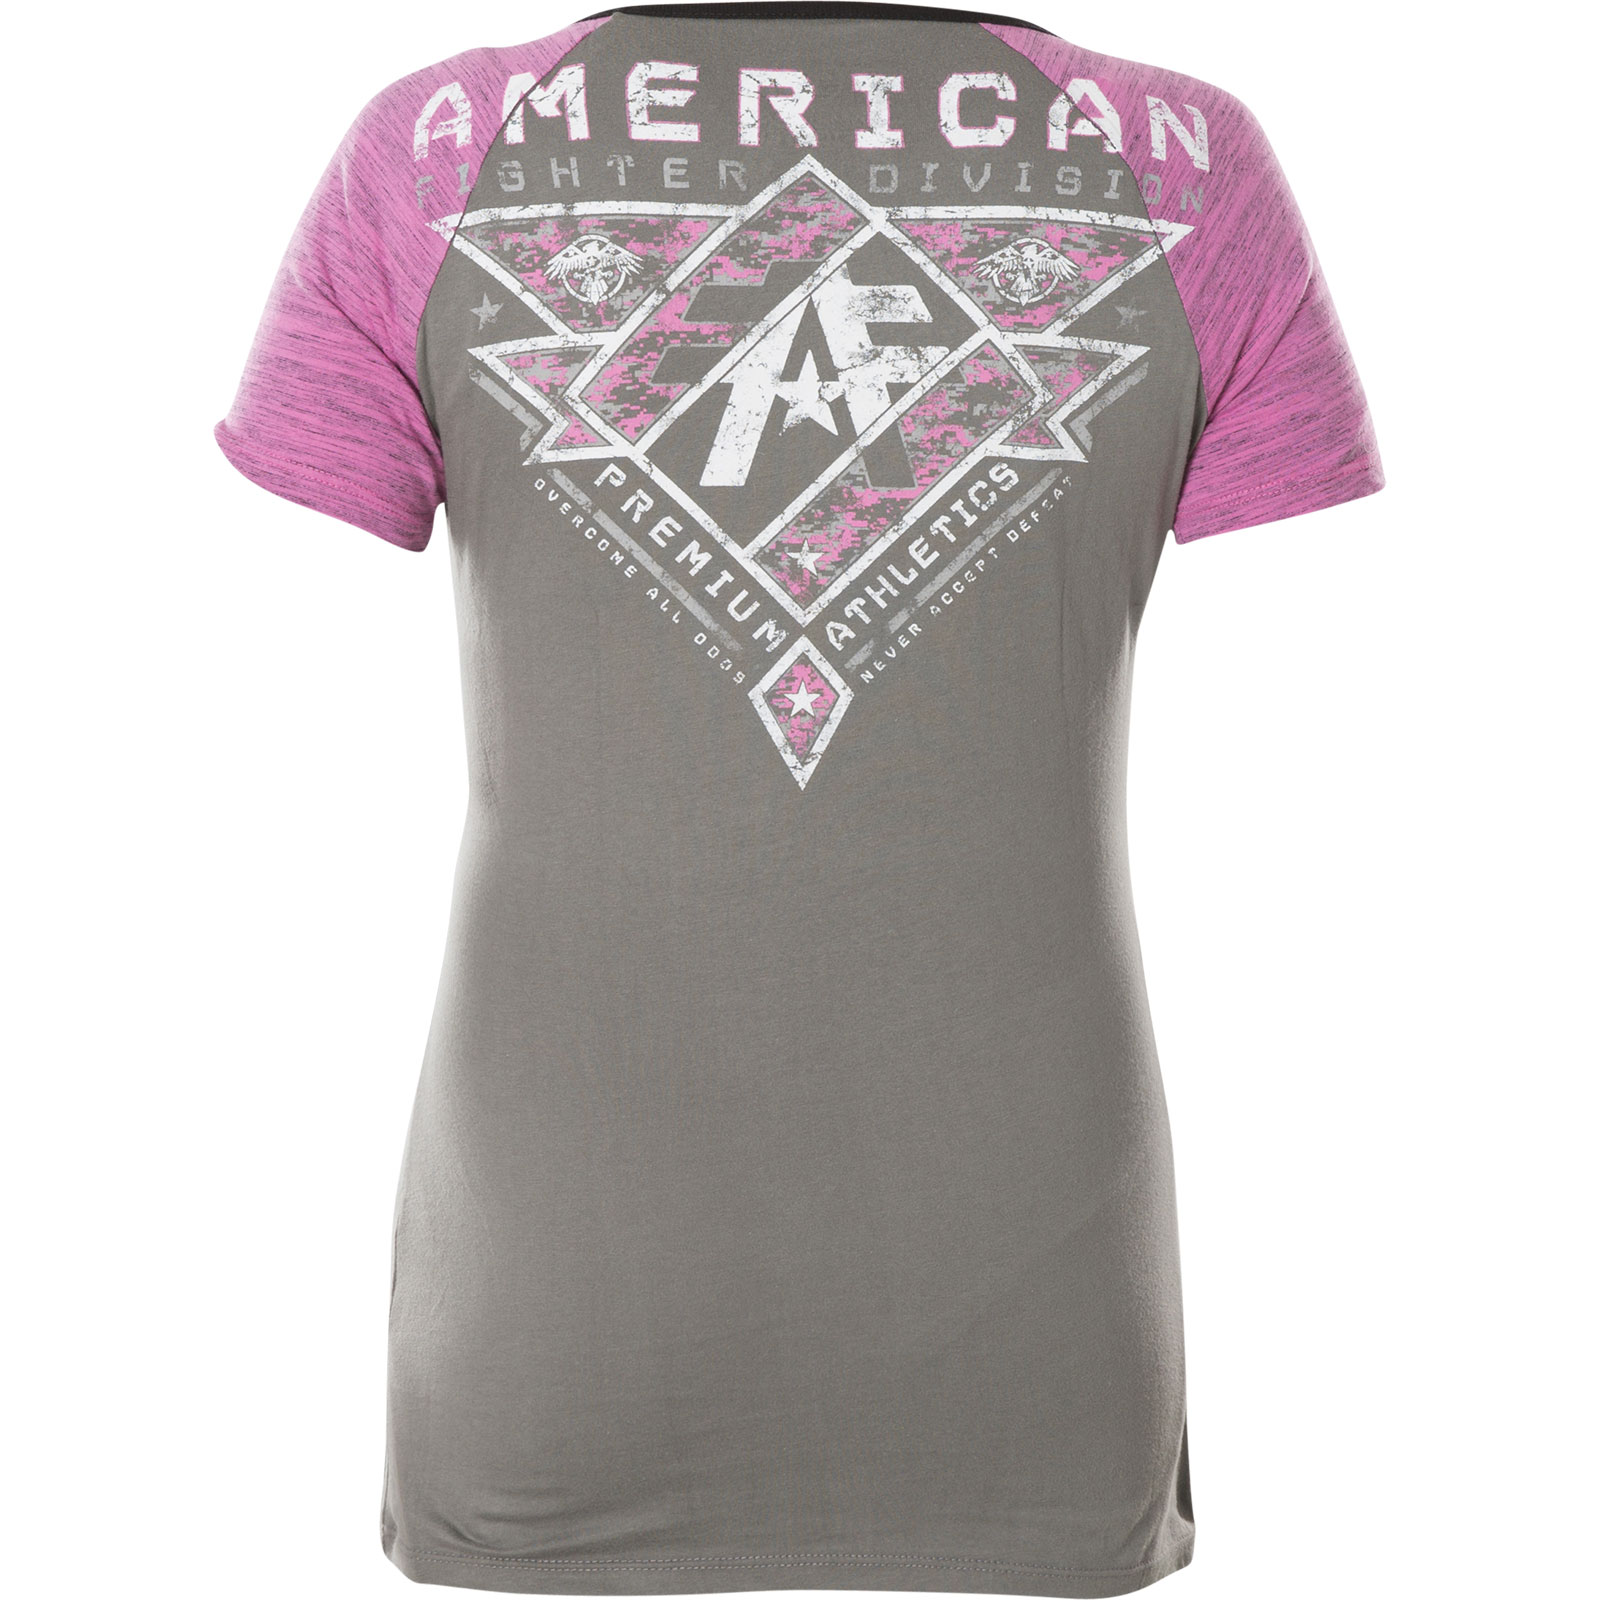 american fighter by affliction bradford mit logo print. Black Bedroom Furniture Sets. Home Design Ideas